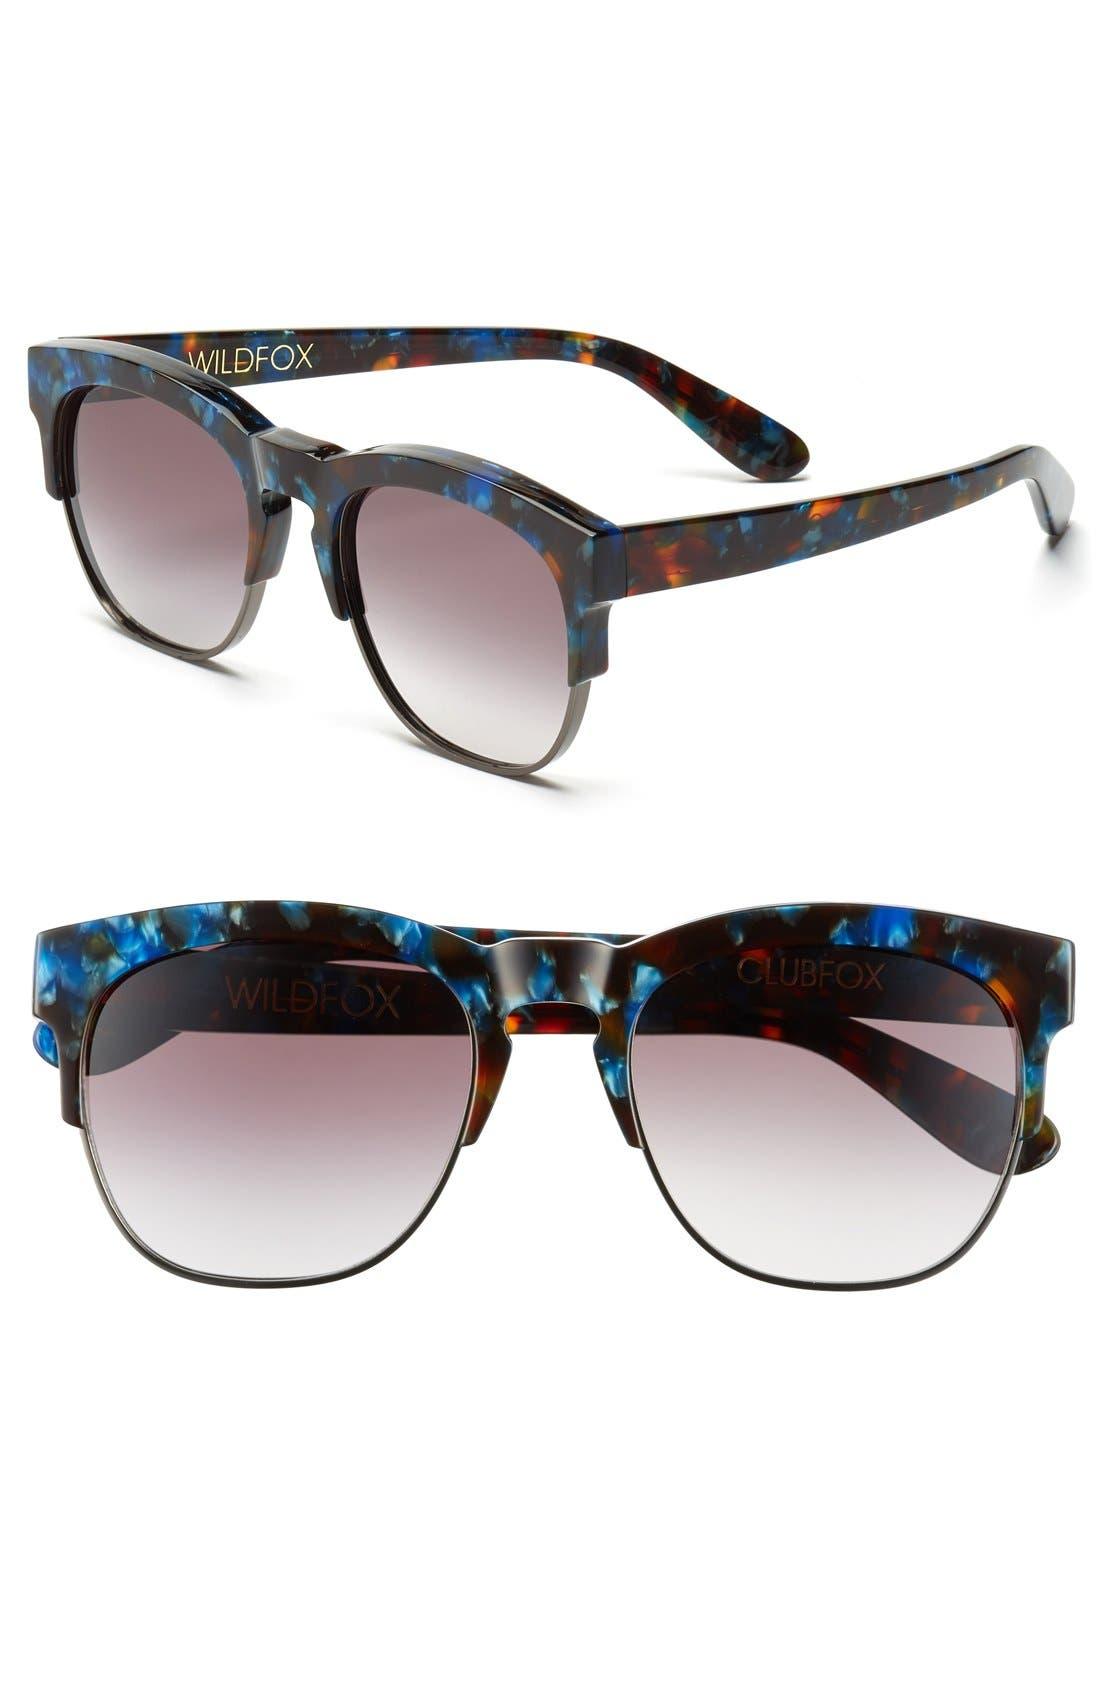 Alternate Image 1 Selected - Wildfox 'Club Fox' 52mm Sunglasses